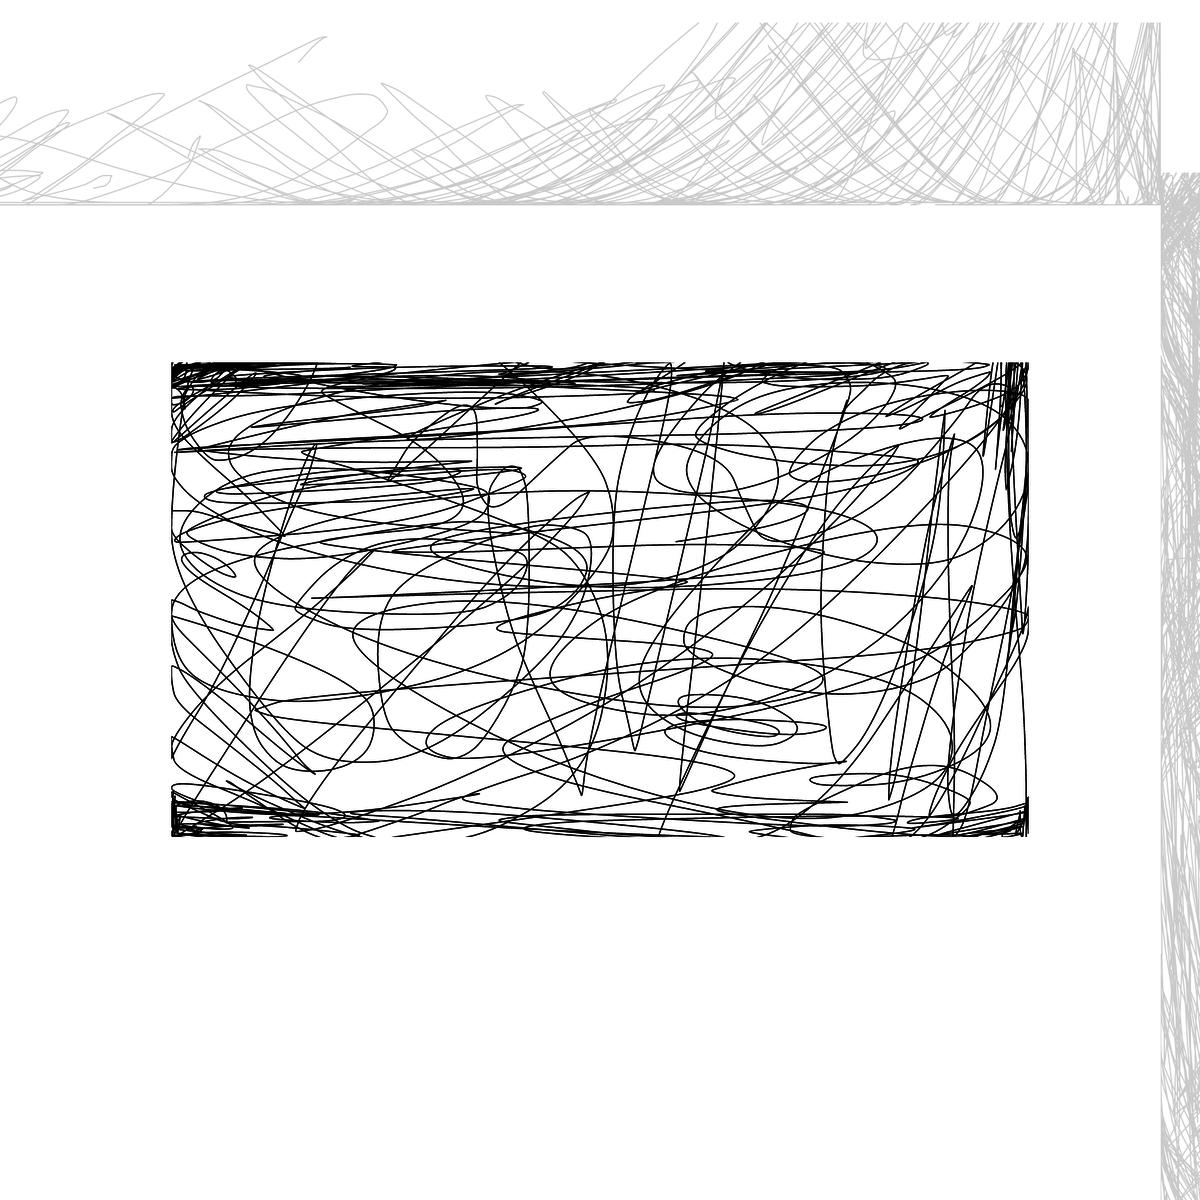 BAAAM drawing#23601 lat:52.4755401611328100lng: 13.4041461944580080